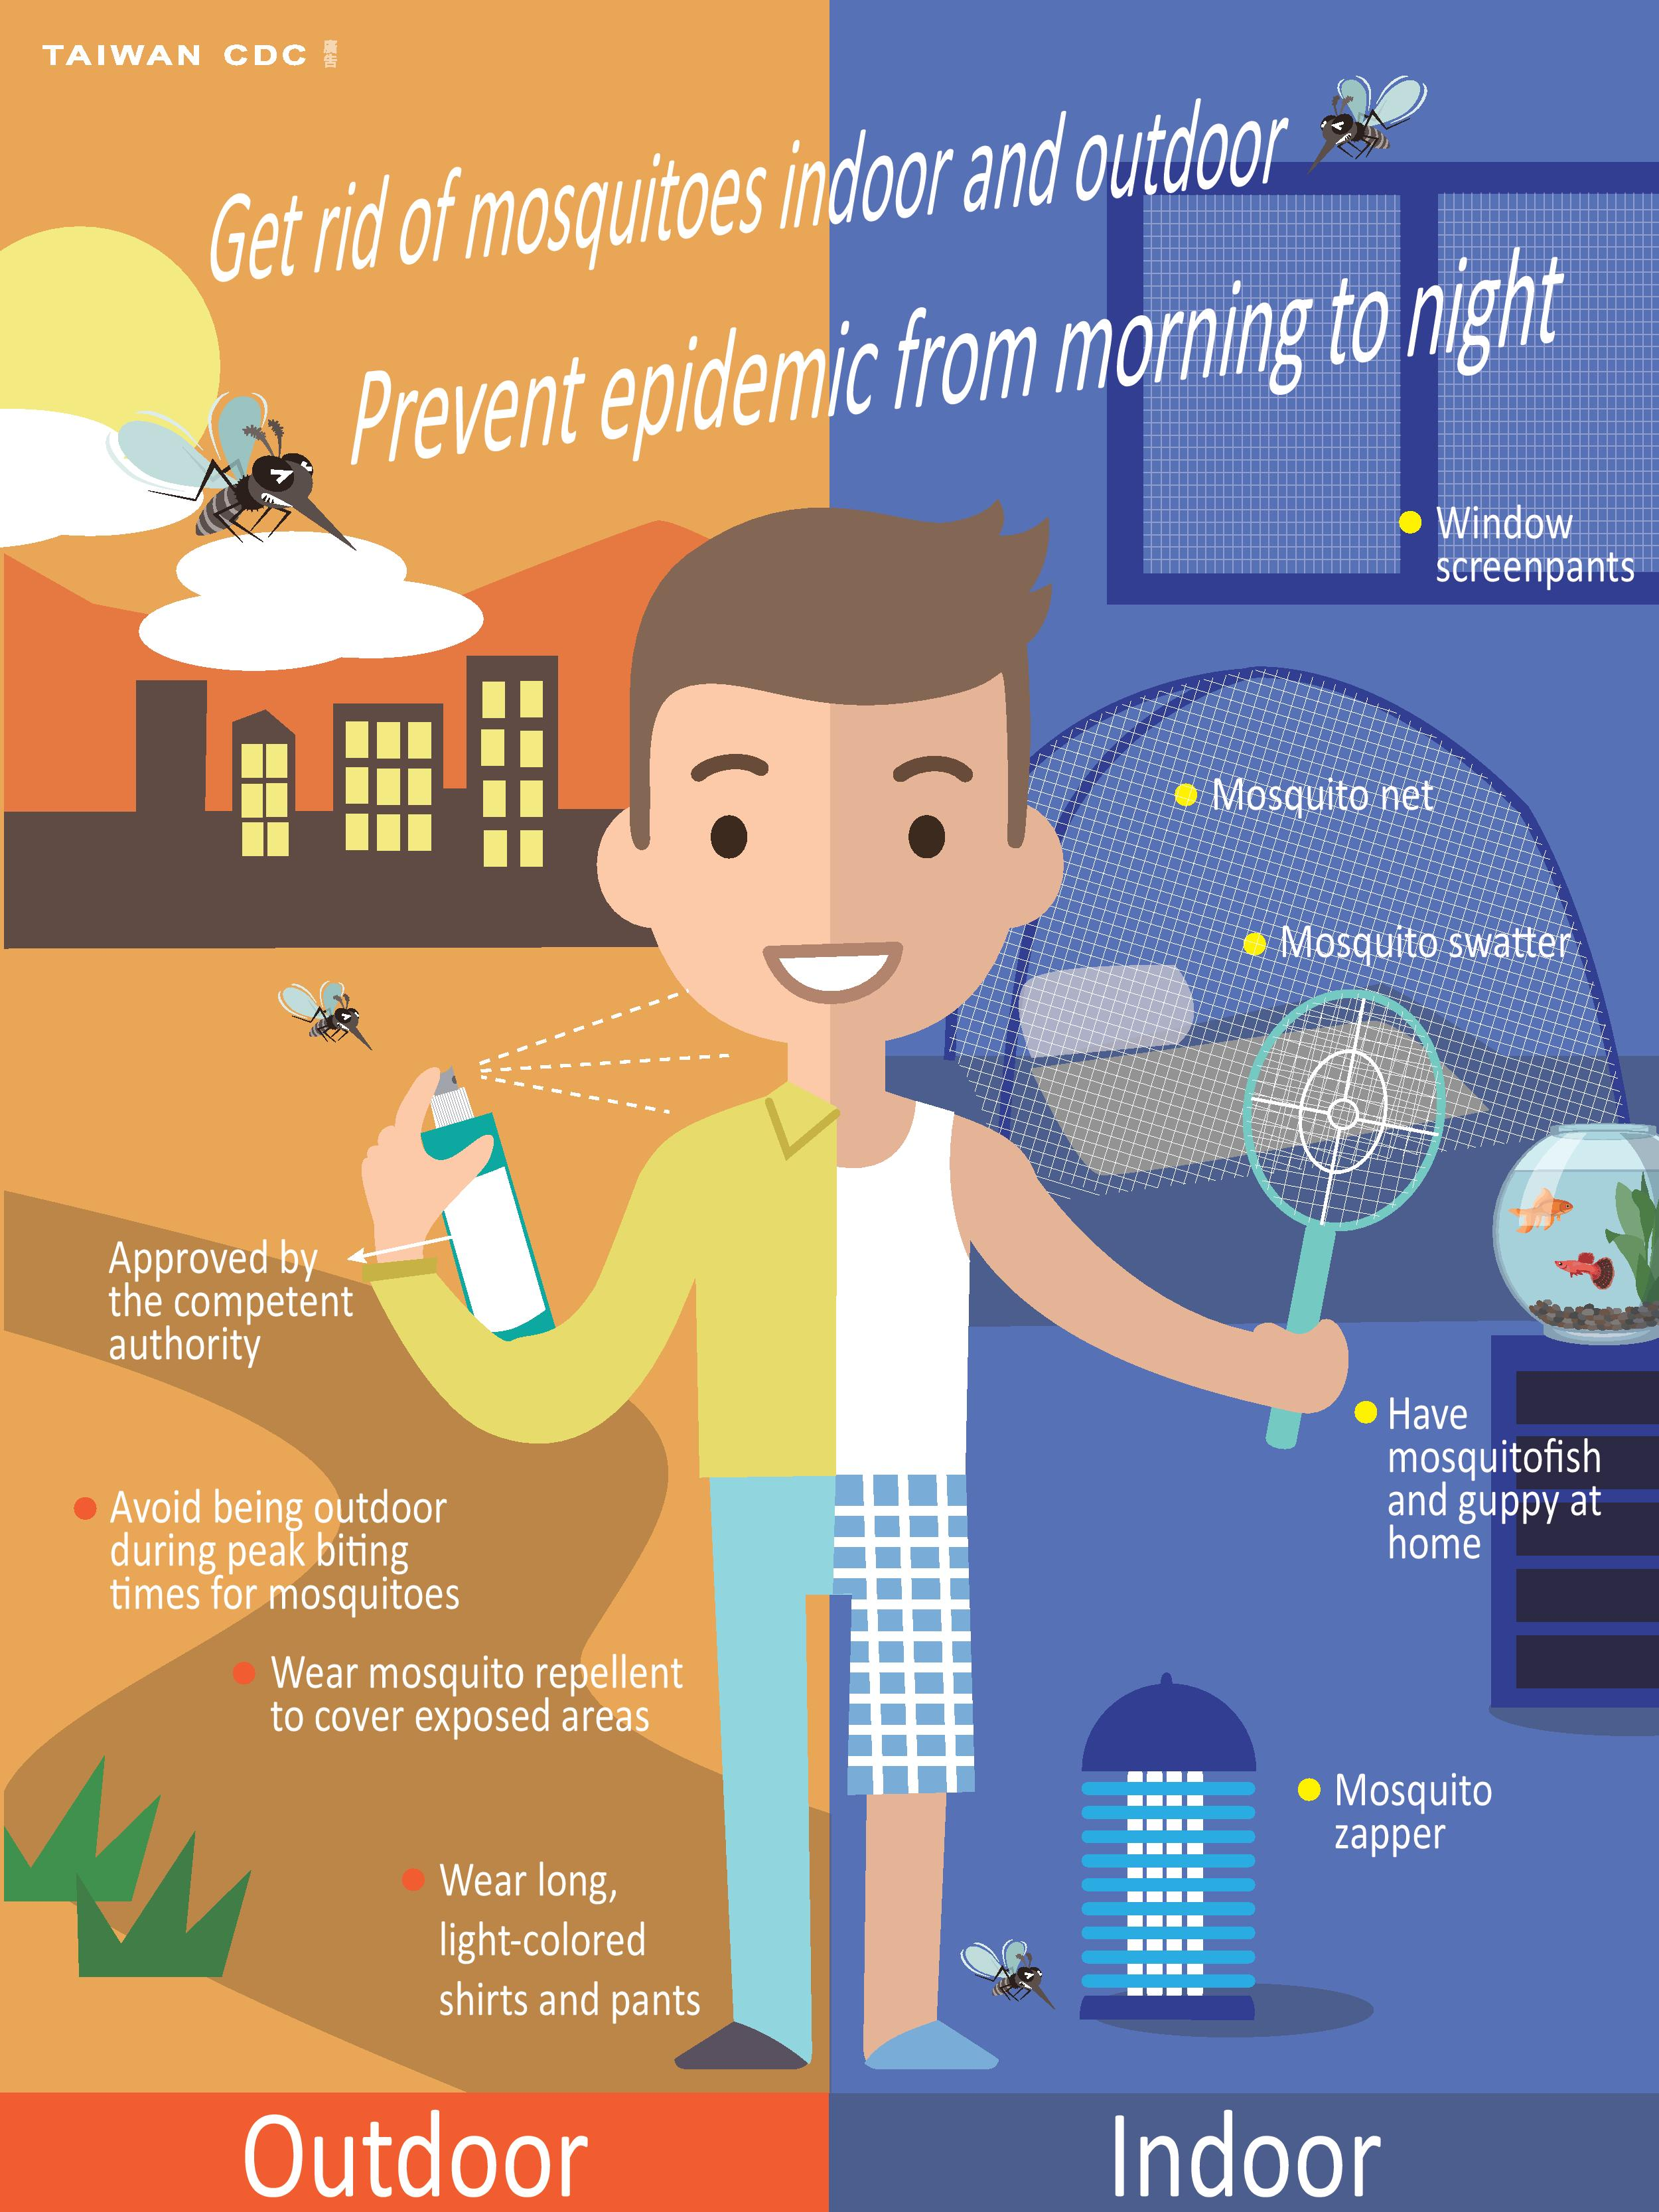 詳如附件【click me】Get rid of mosquitoes indoor and outdoor滅蚊不分內外 防疫從早到晚(英文)